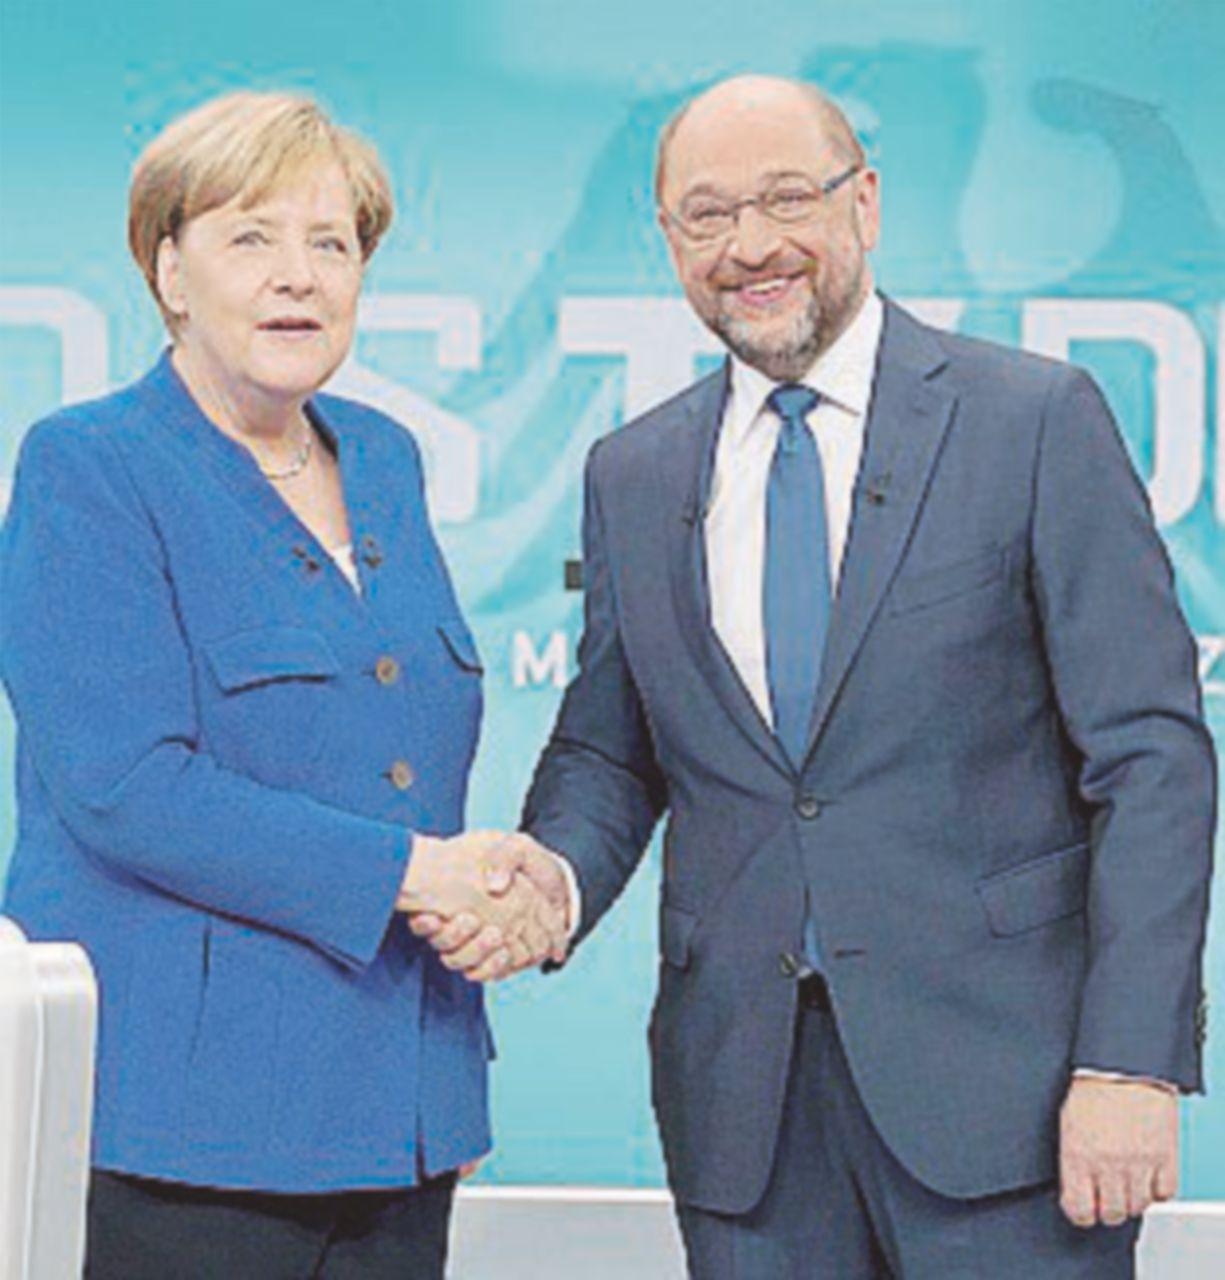 Schulz fallisce l'assalto tv a Merkel e invoca la rottura con la Turchia